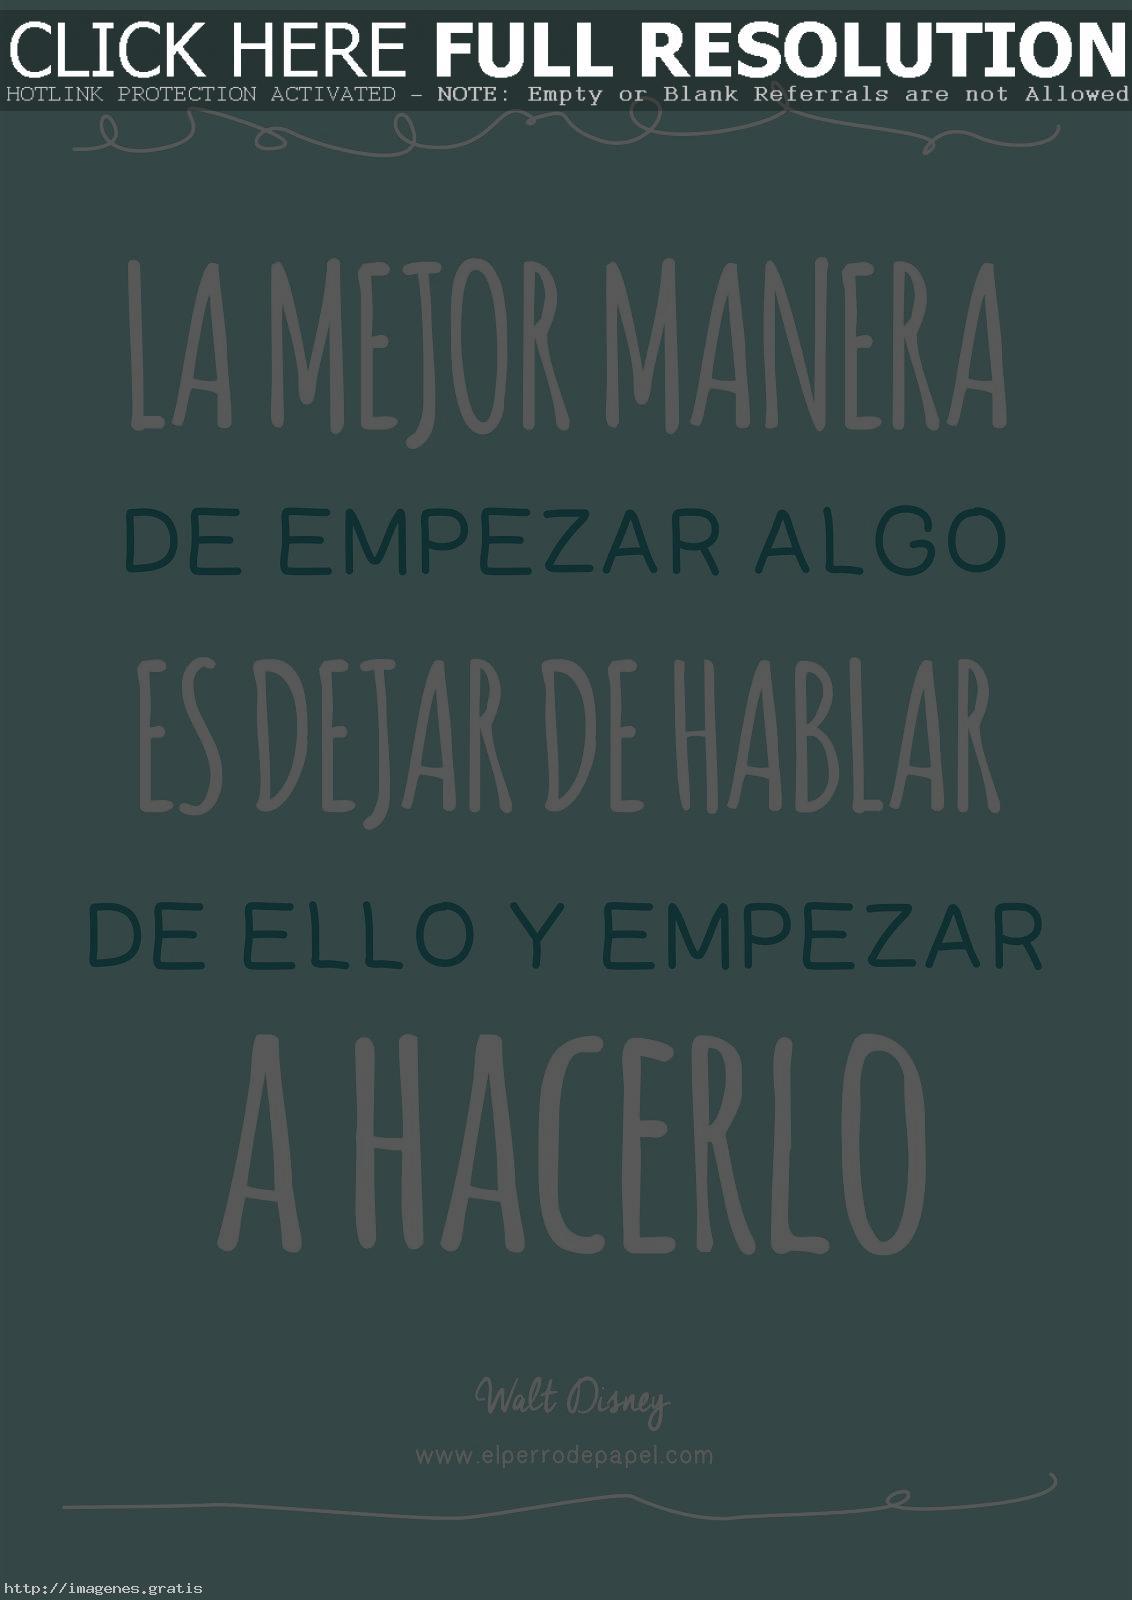 Frases De Coaching Motivadoras Con Liderazgo Para El